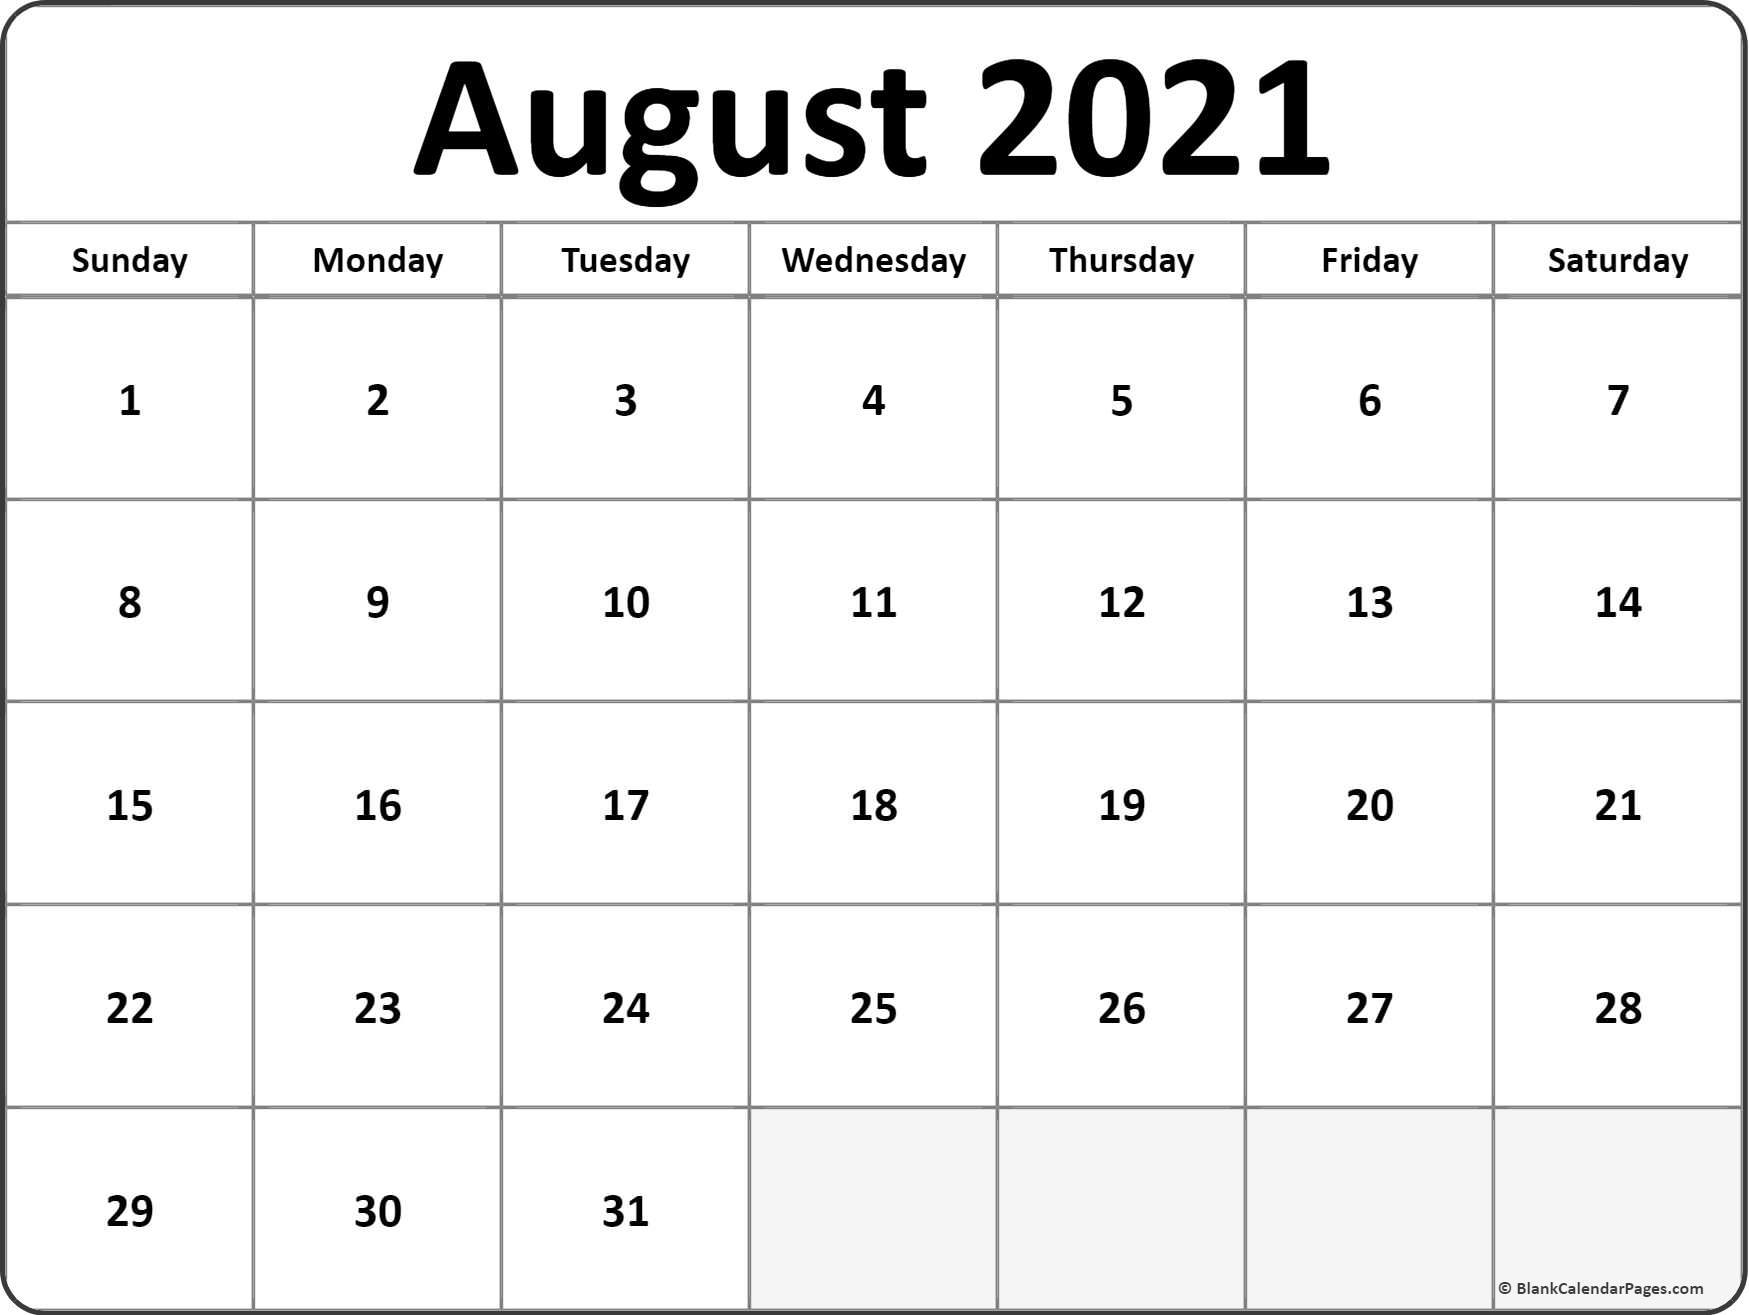 August 2021 Calendar Free Printable Monthly Calendars 3